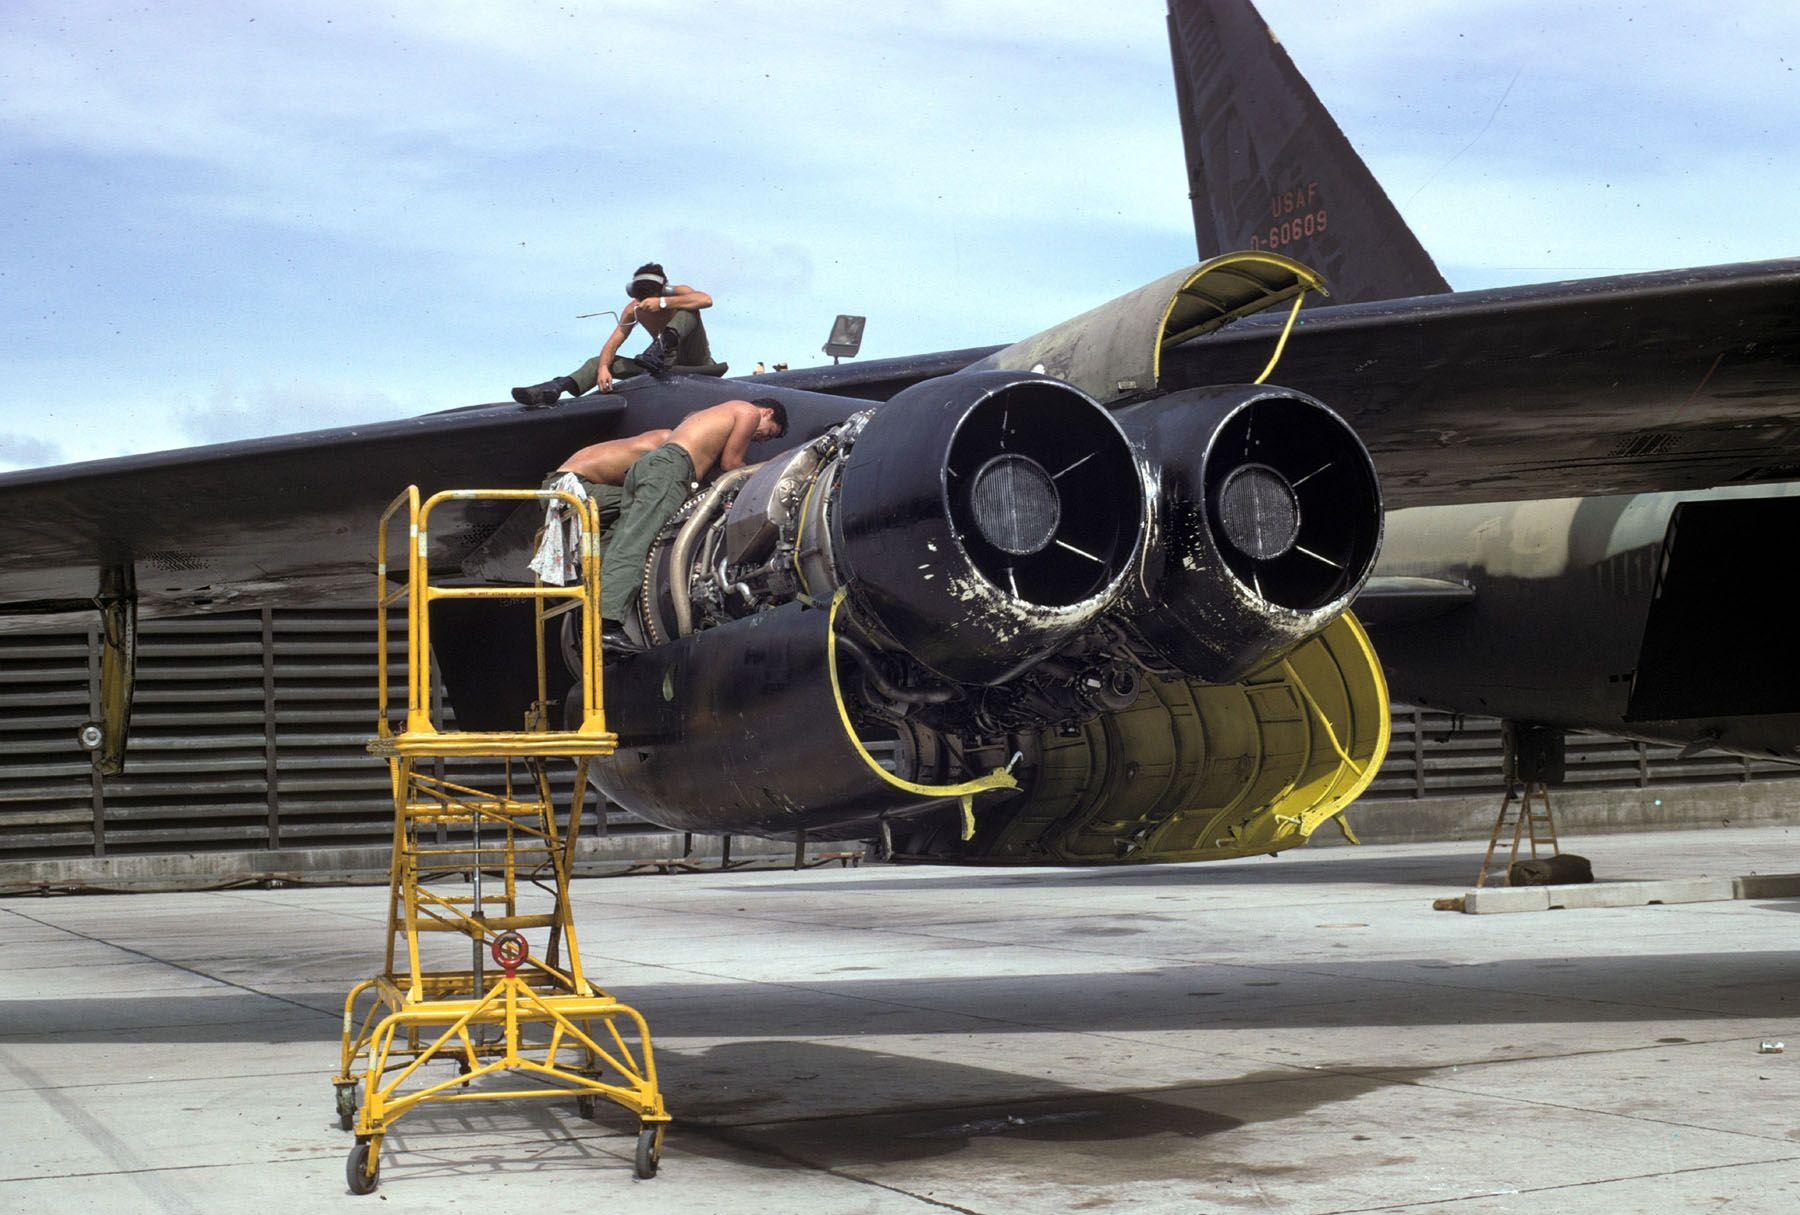 Maintaining The D model Fighter jets, North vietnam, Vietnam